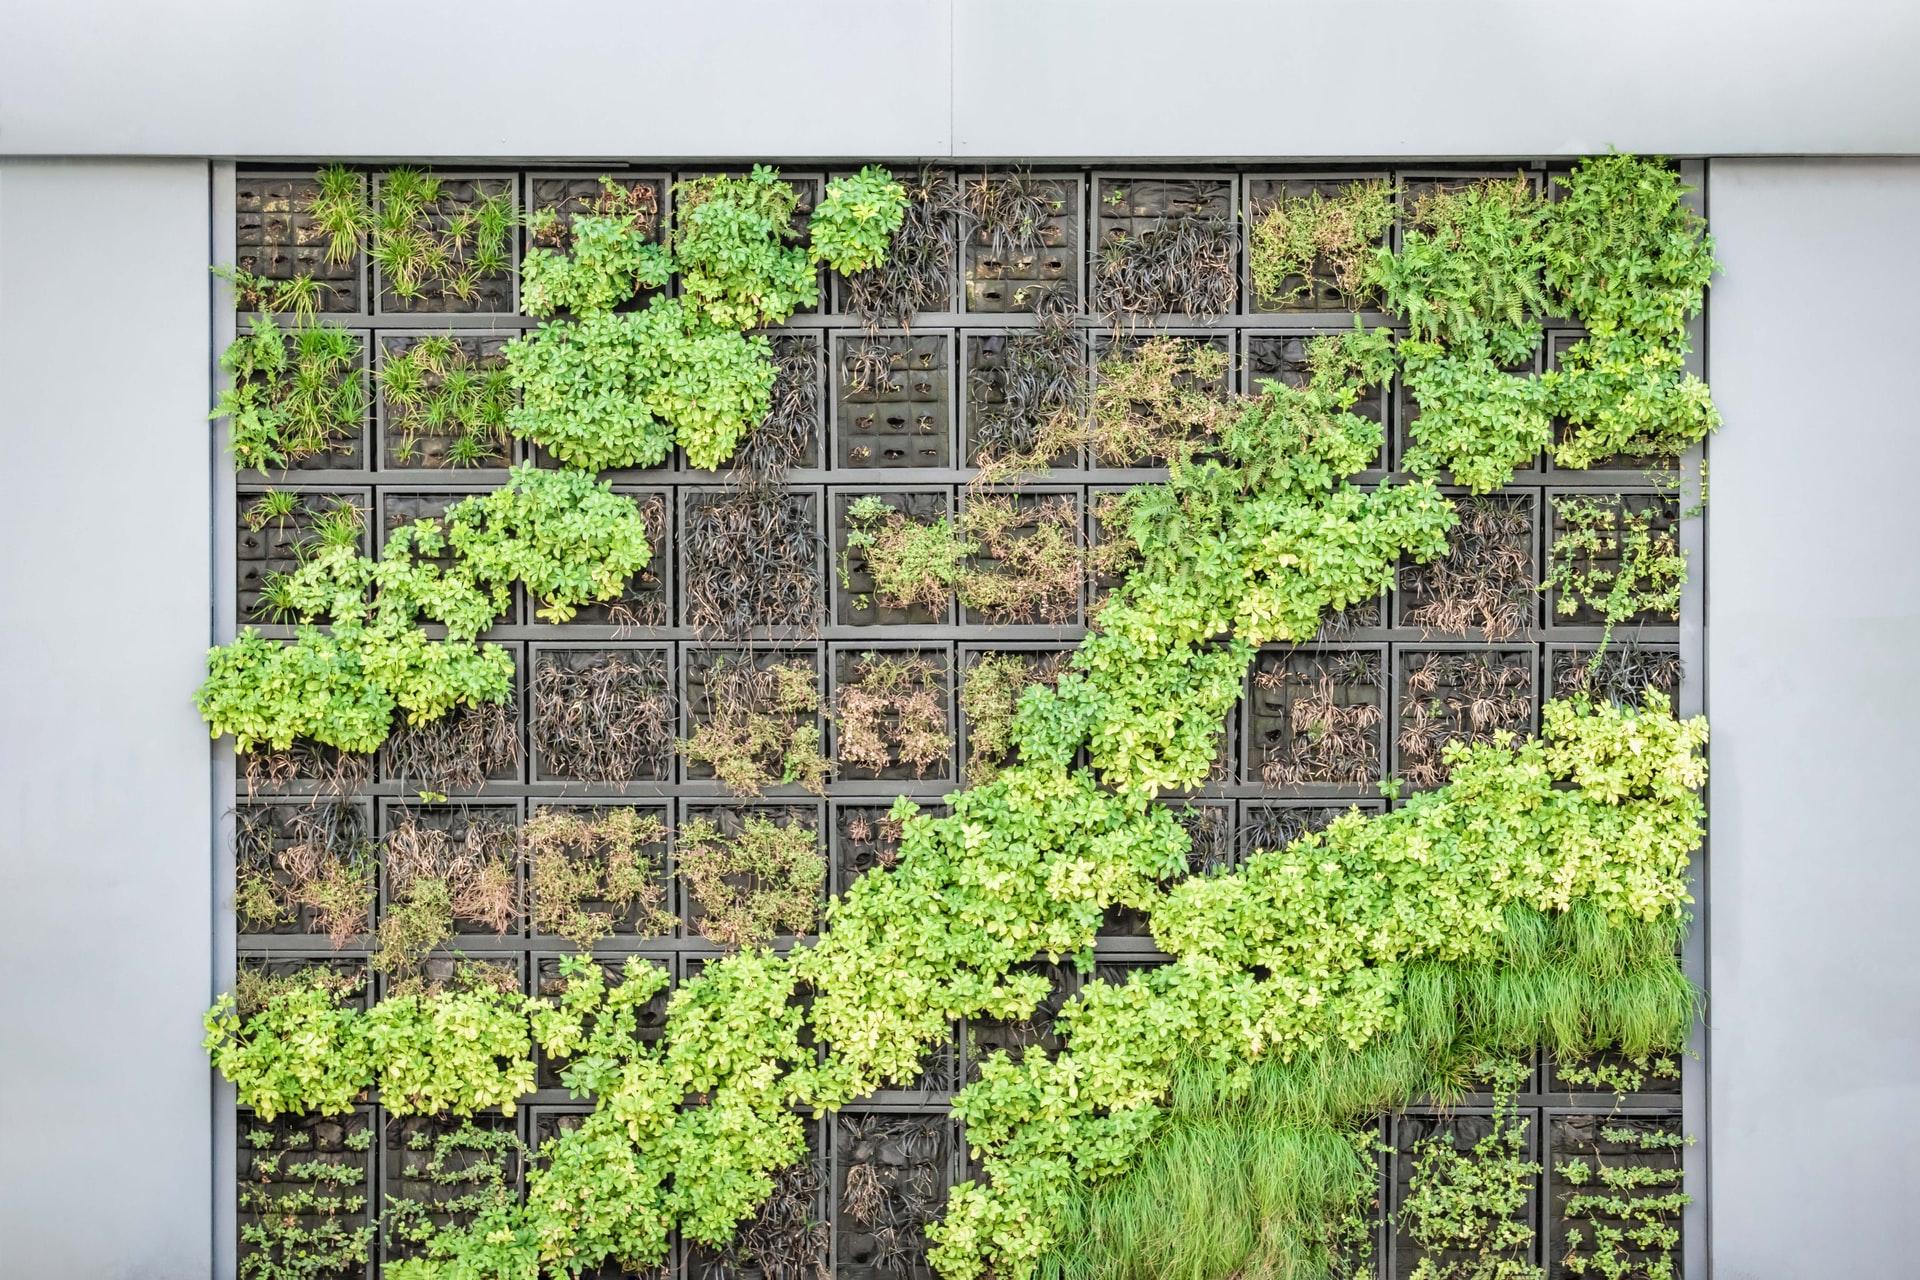 Vertikal Gärtnern: die dritte Dimension erobern